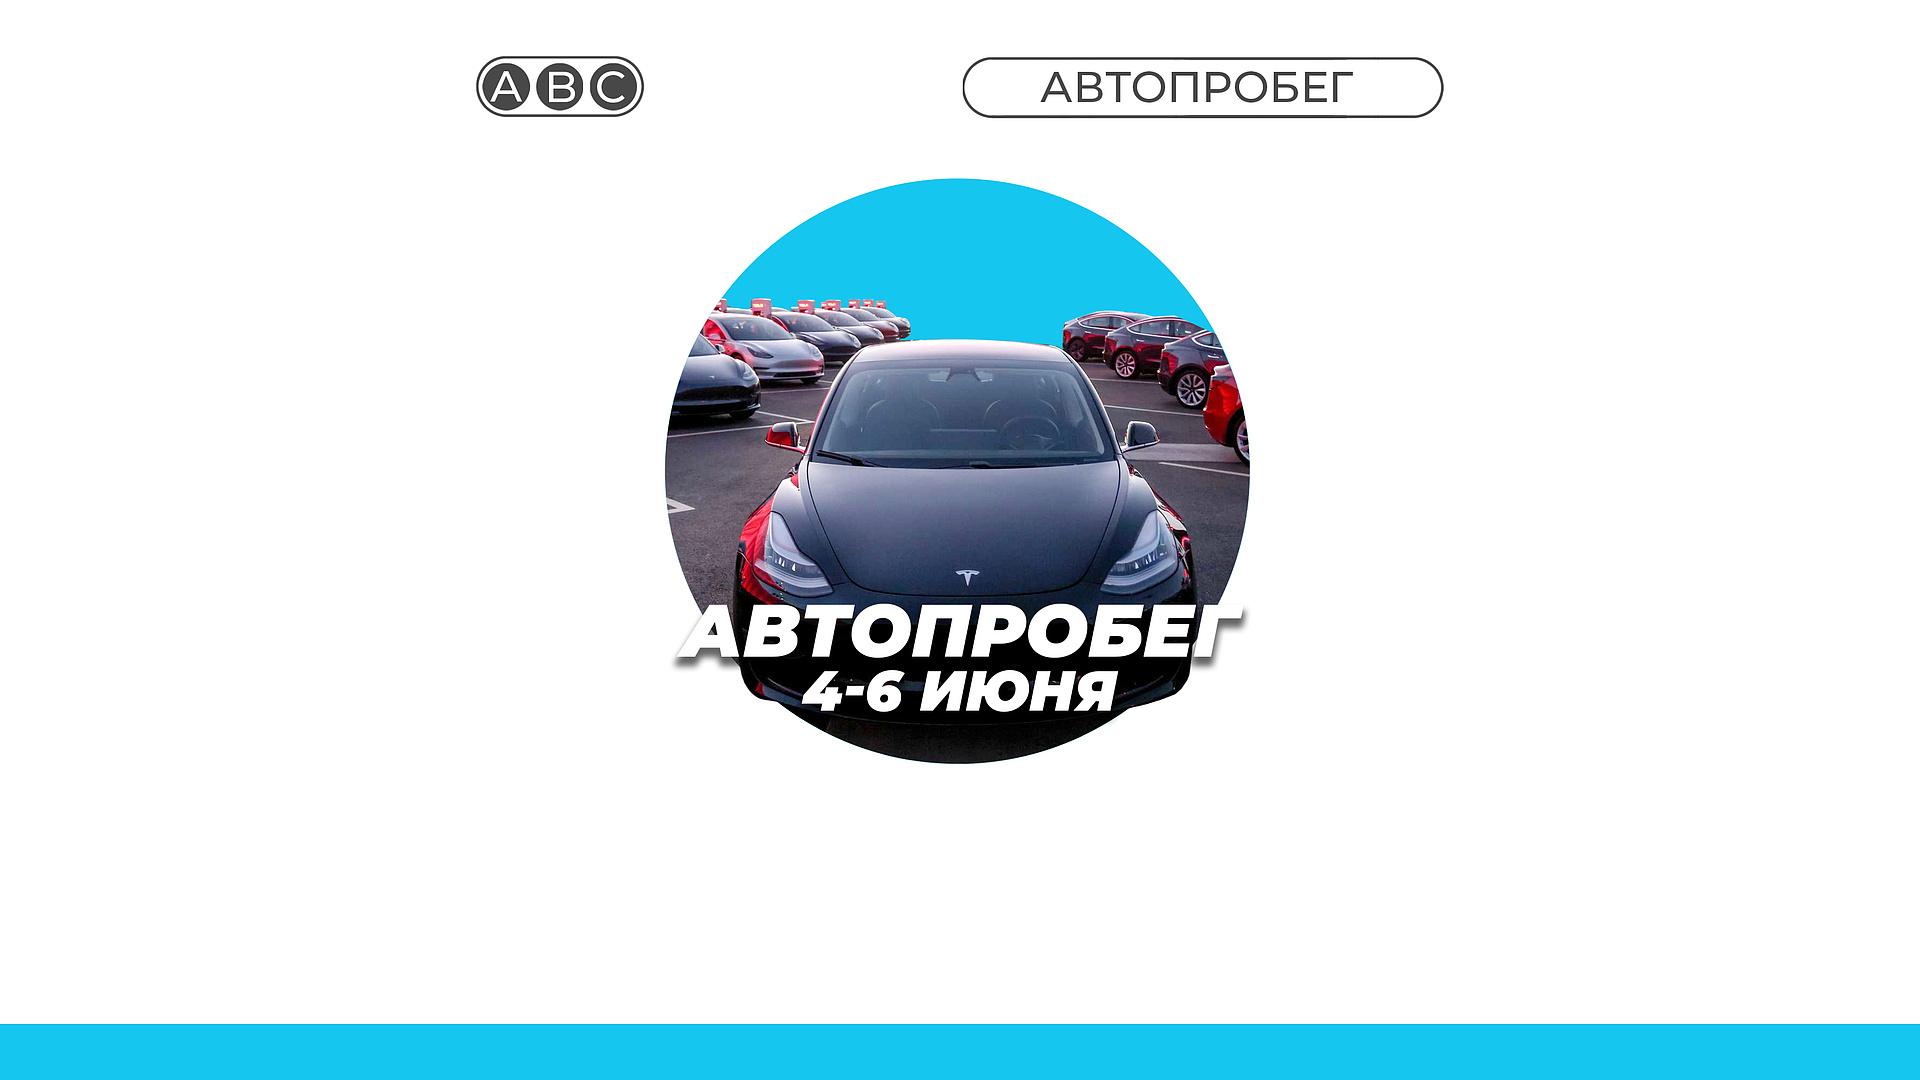 Объявлен набор в команду организаторов АВТОПРОБЕГА на ЭЛЕКТРОТРАНСПОРТЕ